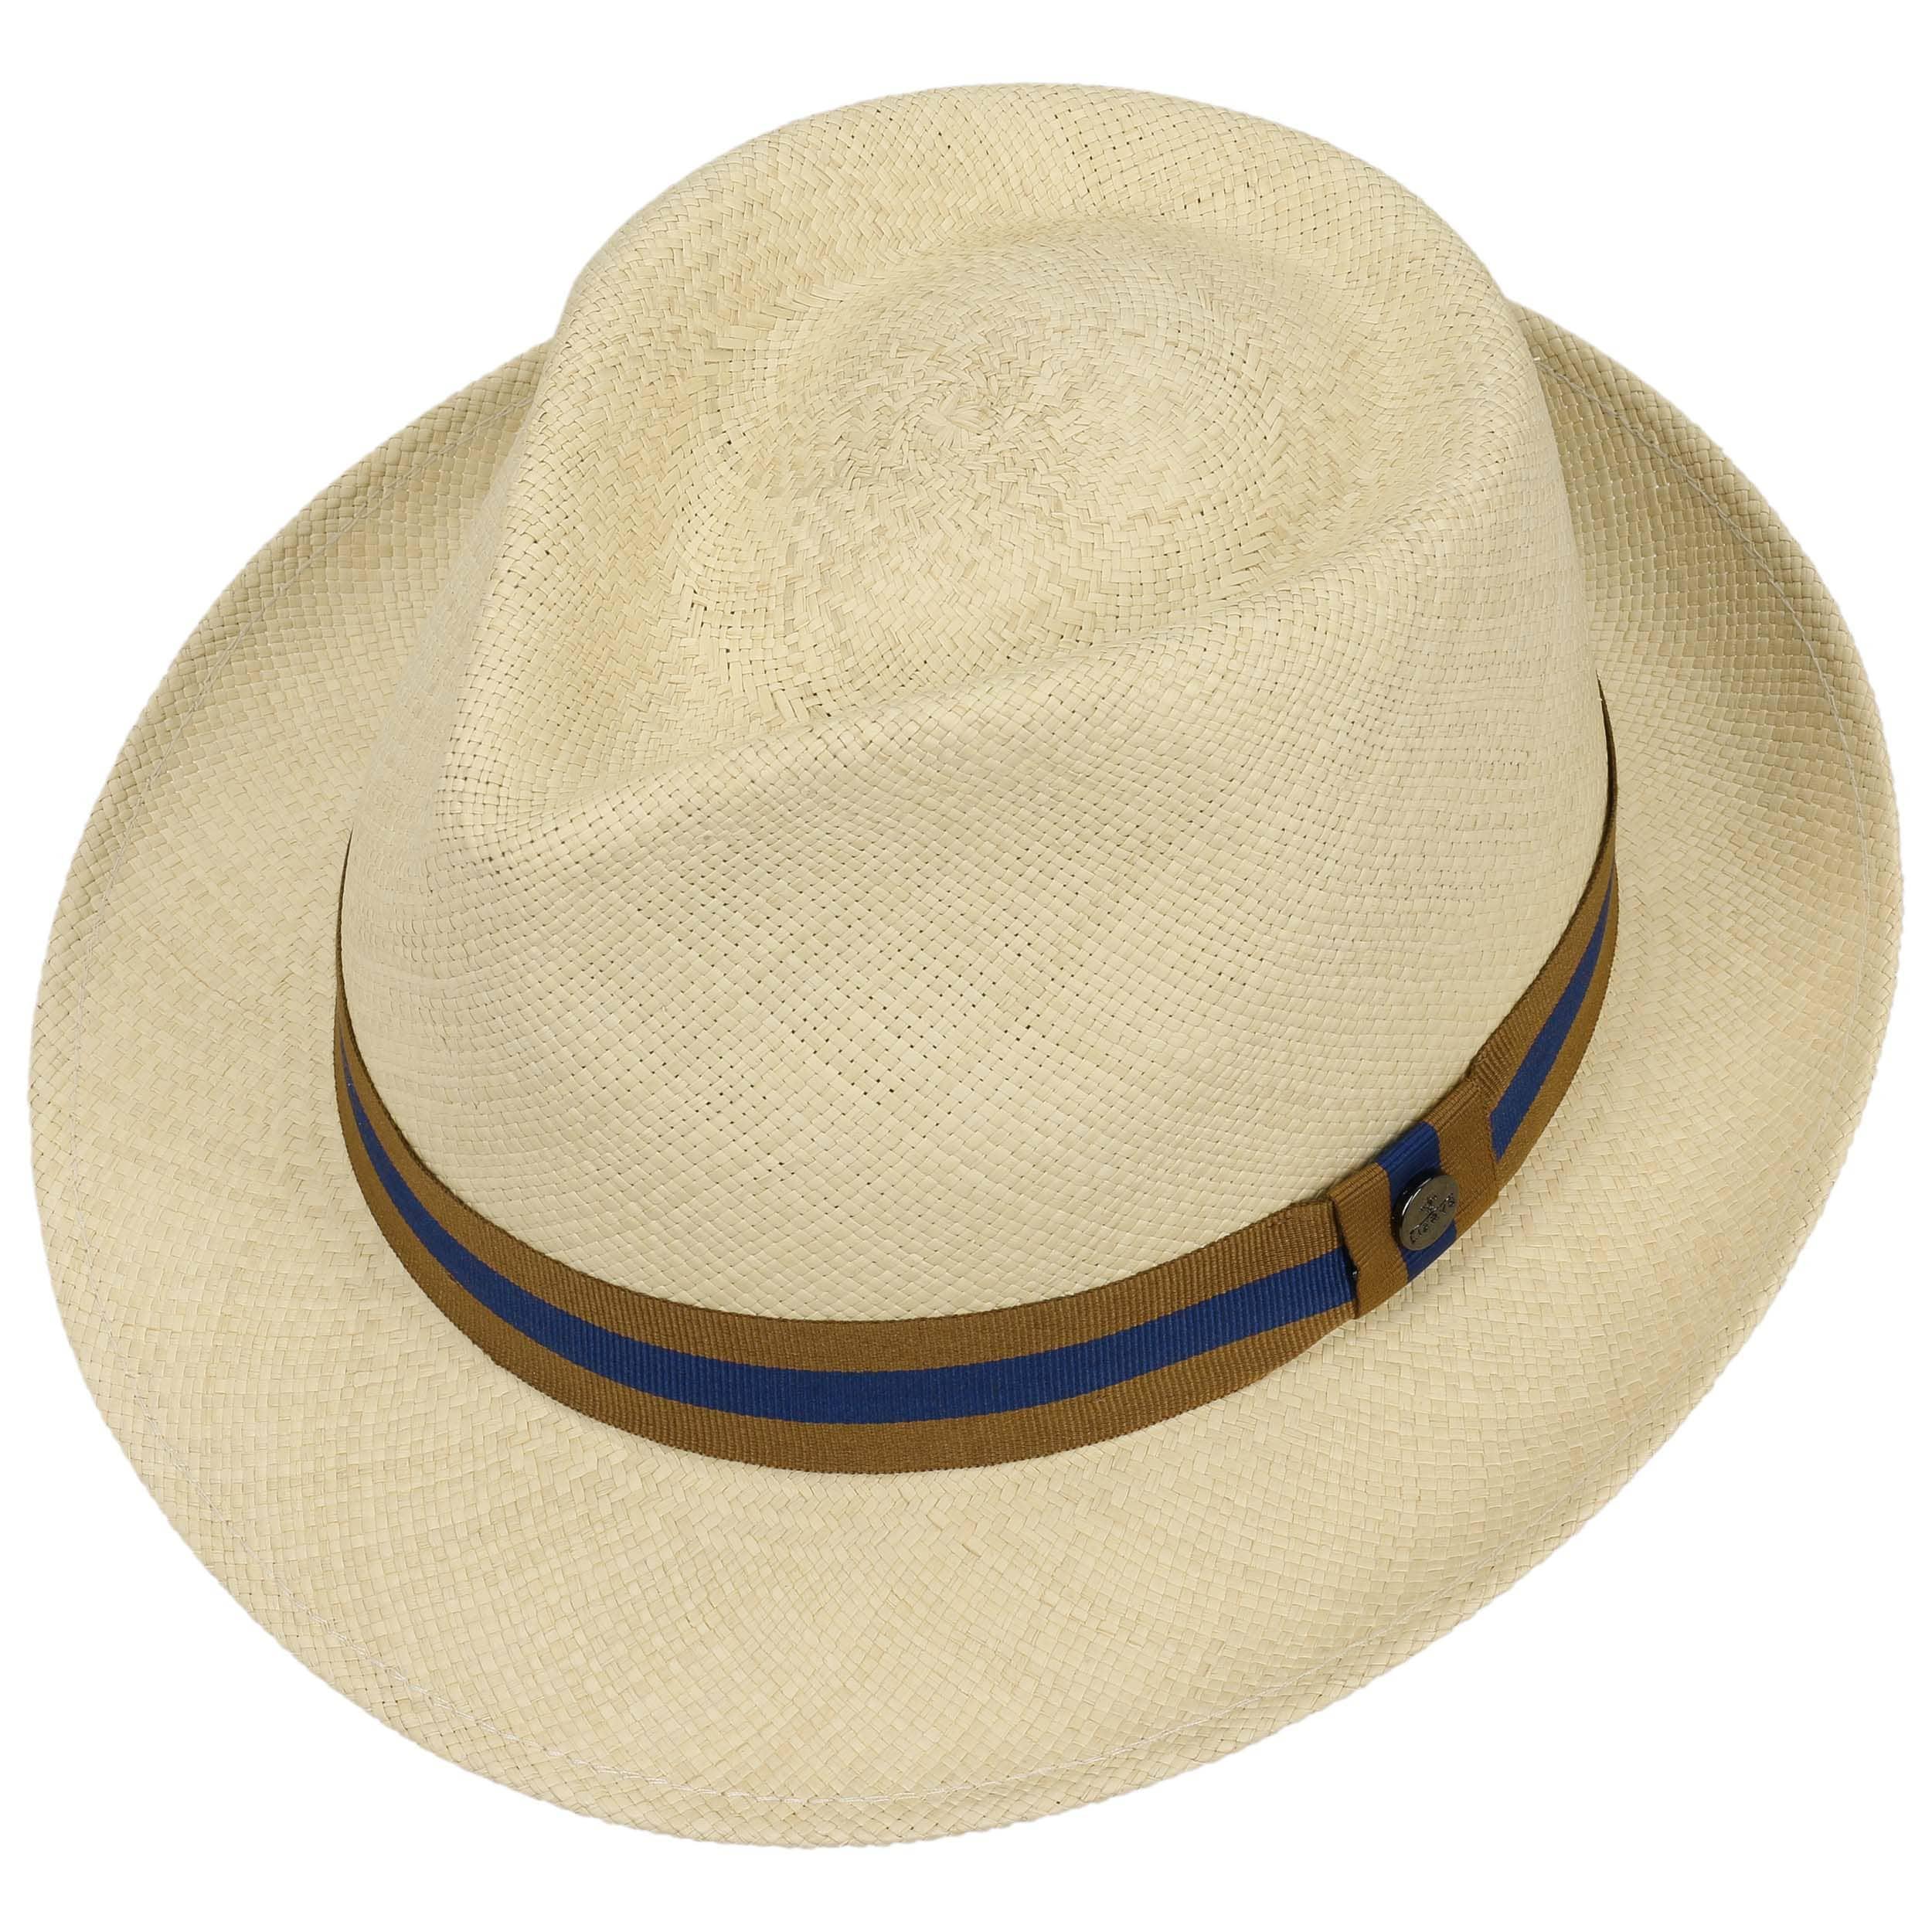 ... Sportive Trilby Panama Hat by Lierys - nature-beige 1 ... 46a800e809a0